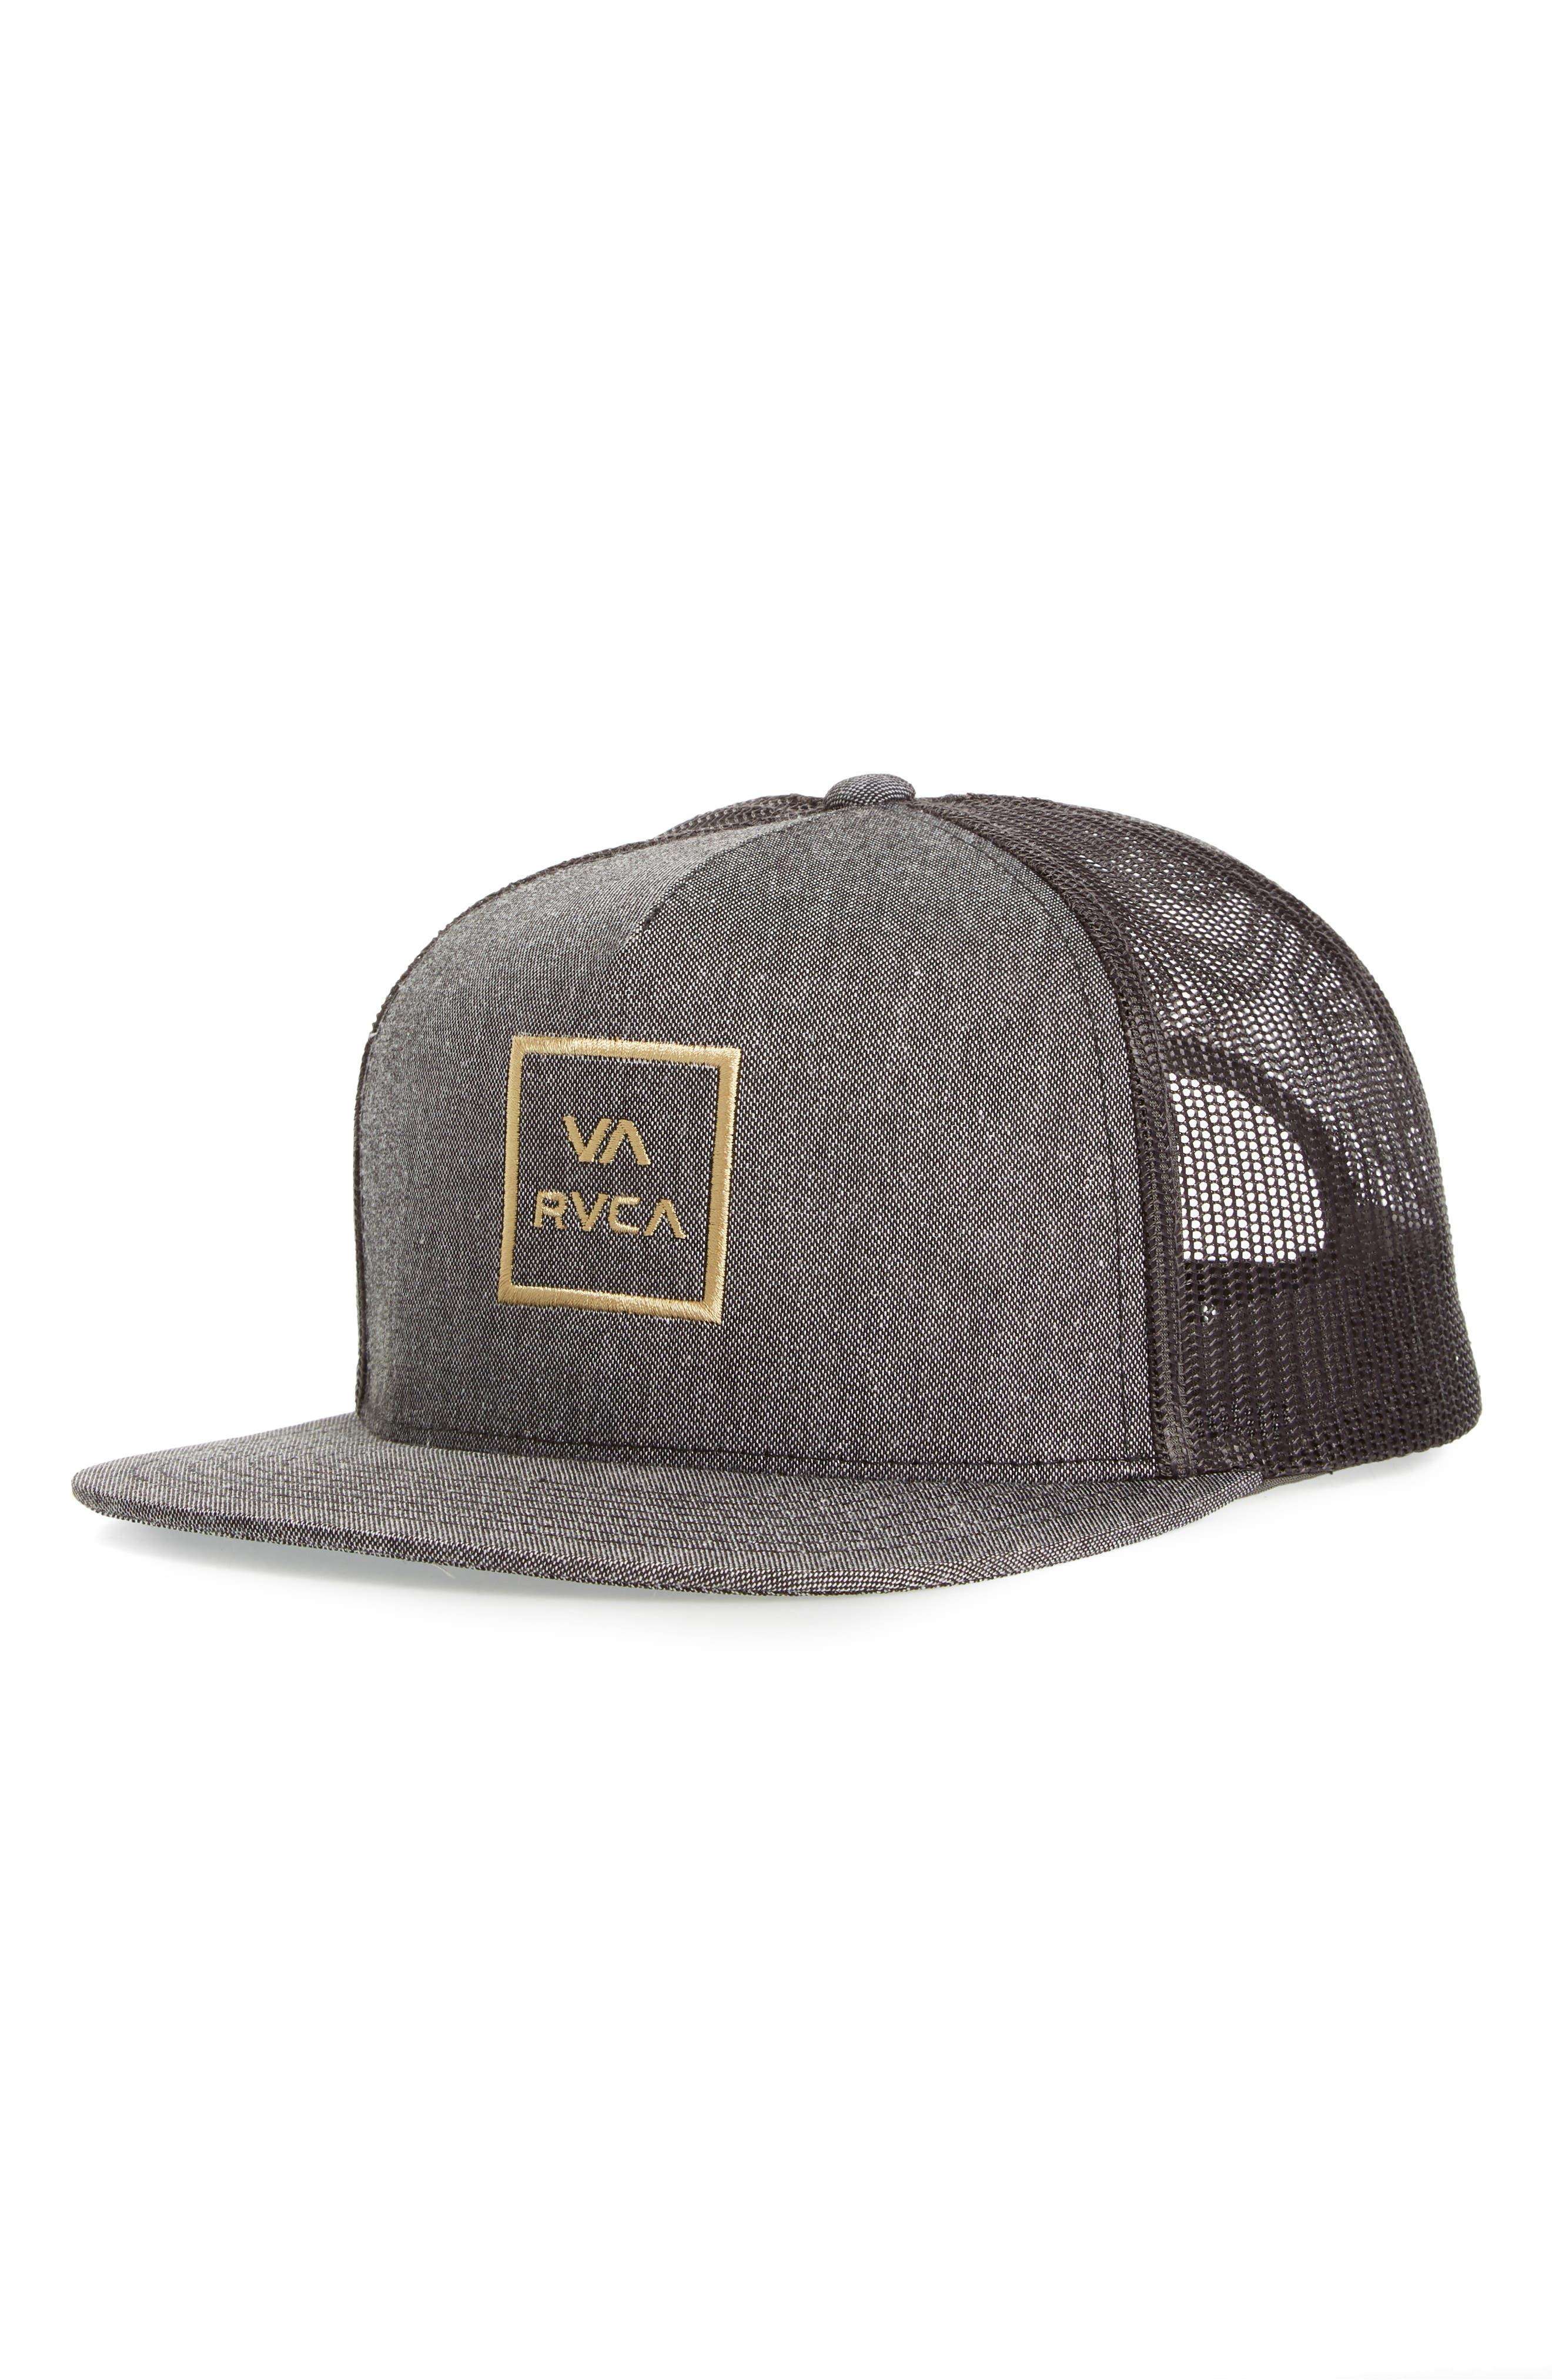 RVCA, VA All the Way Trucker Hat, Main thumbnail 1, color, DARK CHARCOAL HEATHER